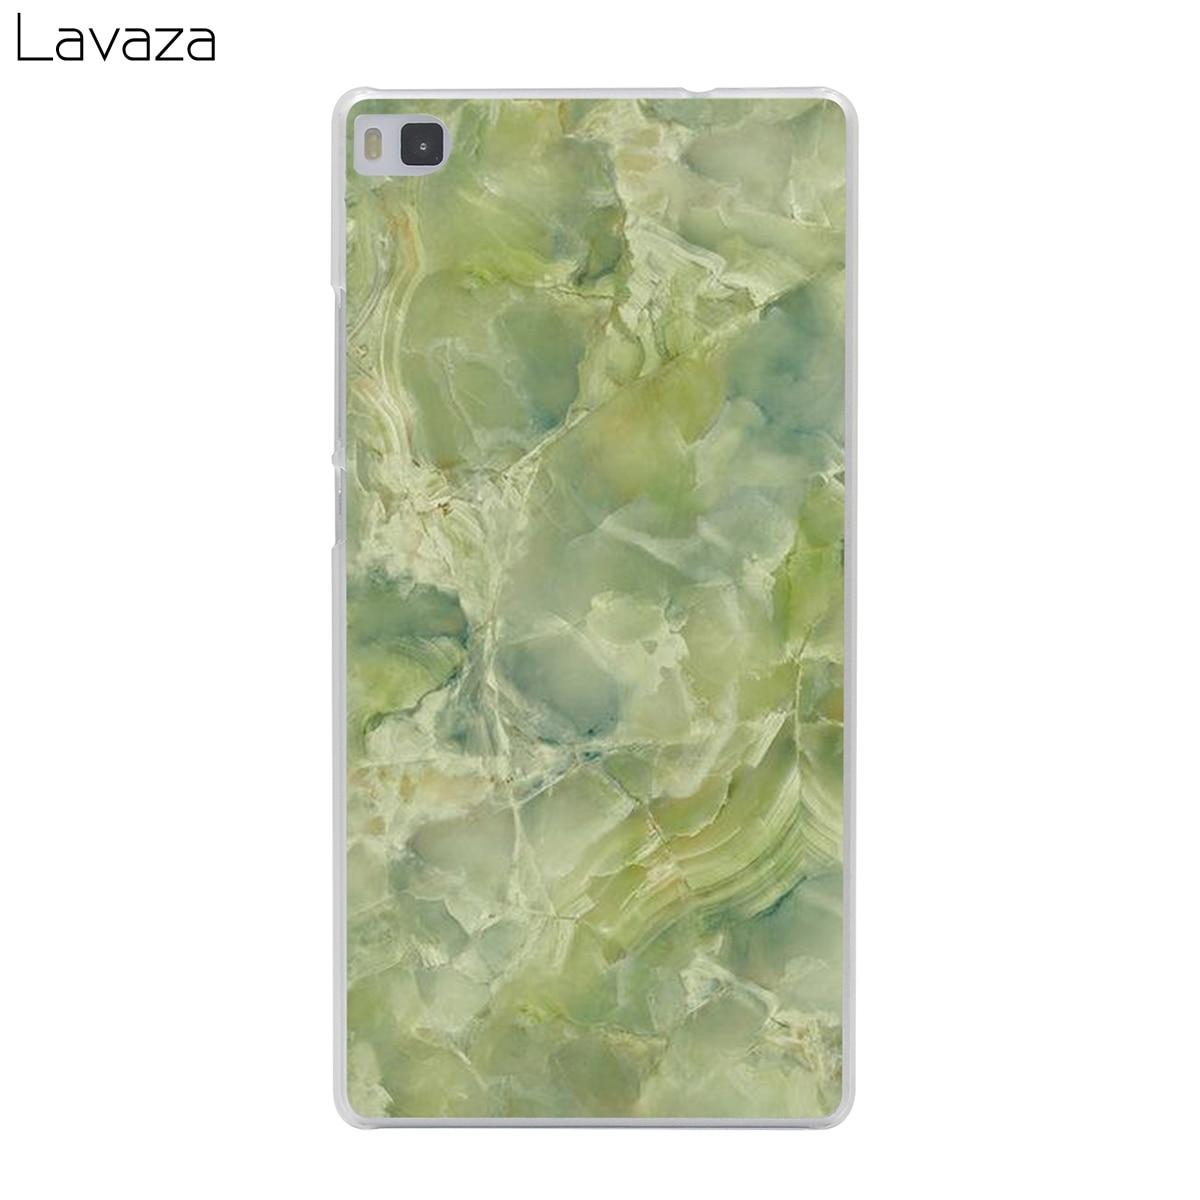 Lavaza довольно Мрамор Чехол для мобильного huawei Коврики P9 P8 P10 P20 10 9 Lite плюс Pro Mini 2017 P smart